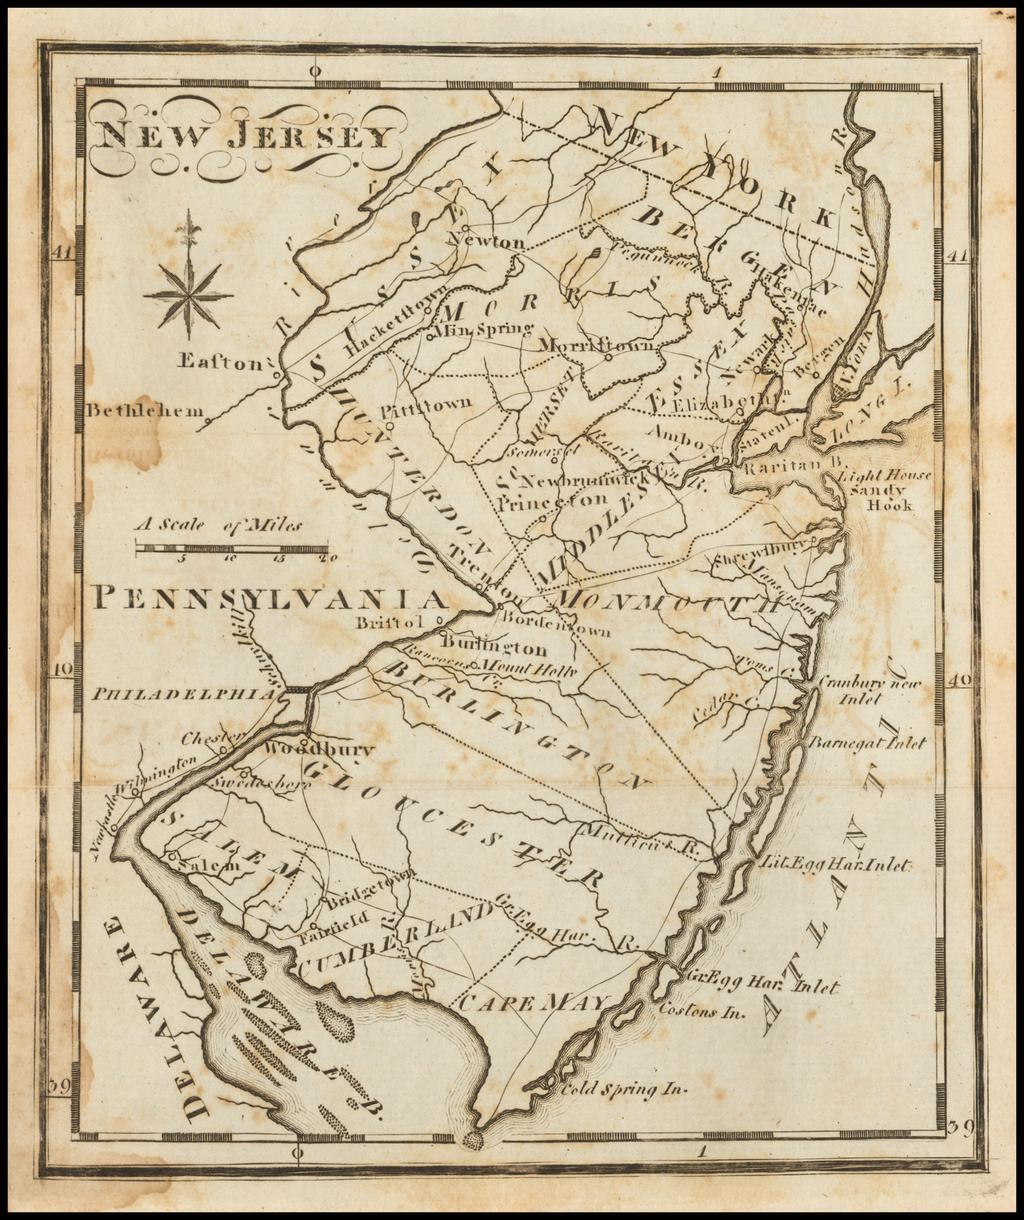 New Jersey By Joseph Scott